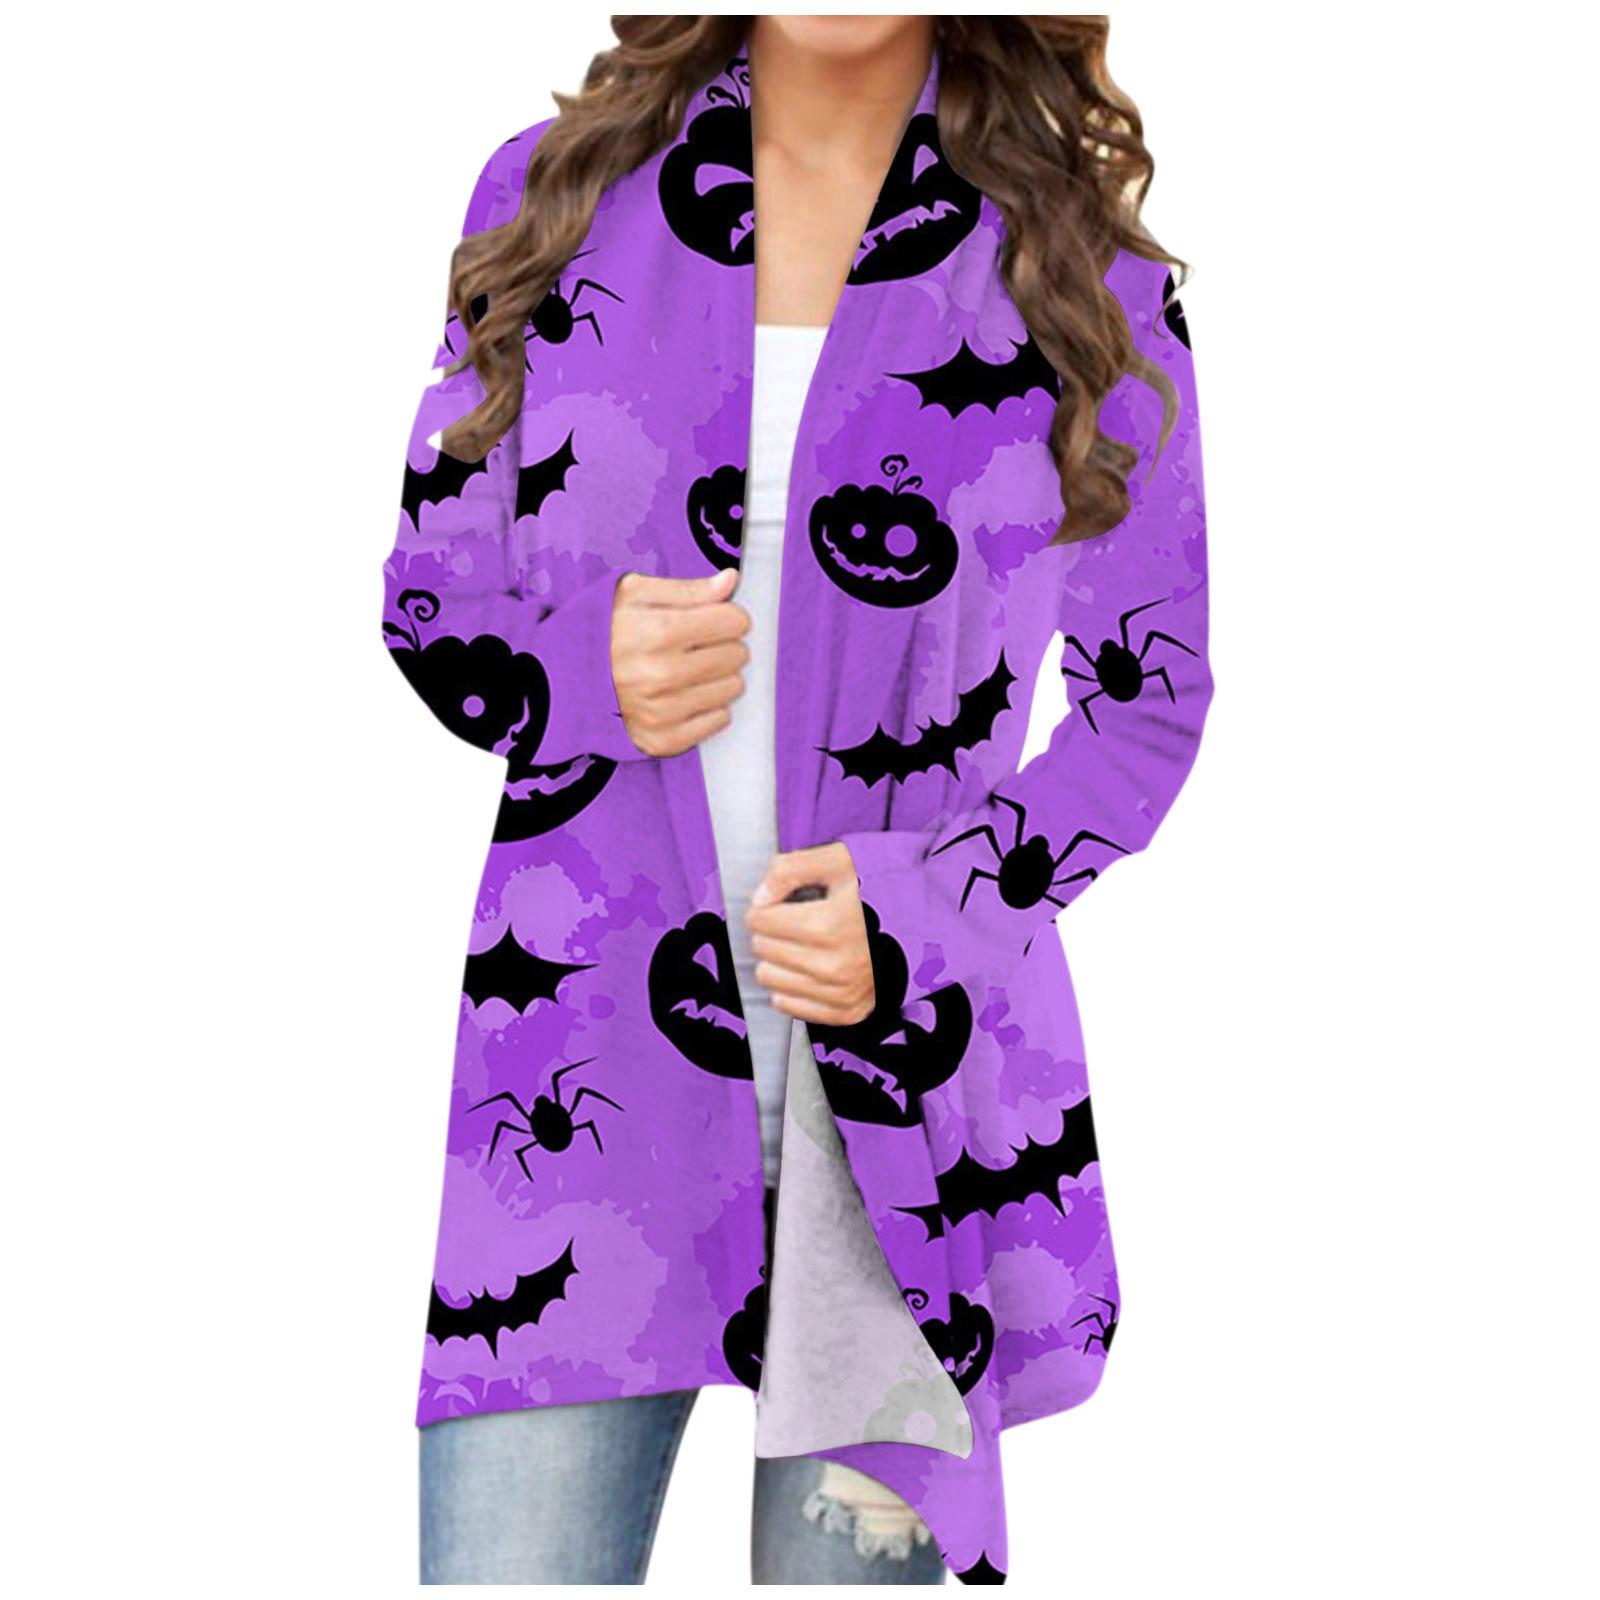 Owl Animal Print Women's Cardigan Casual Halloween Pumpkin Print Girl Top Long Sleeve Western Style Kawaii Funny Female Blouse